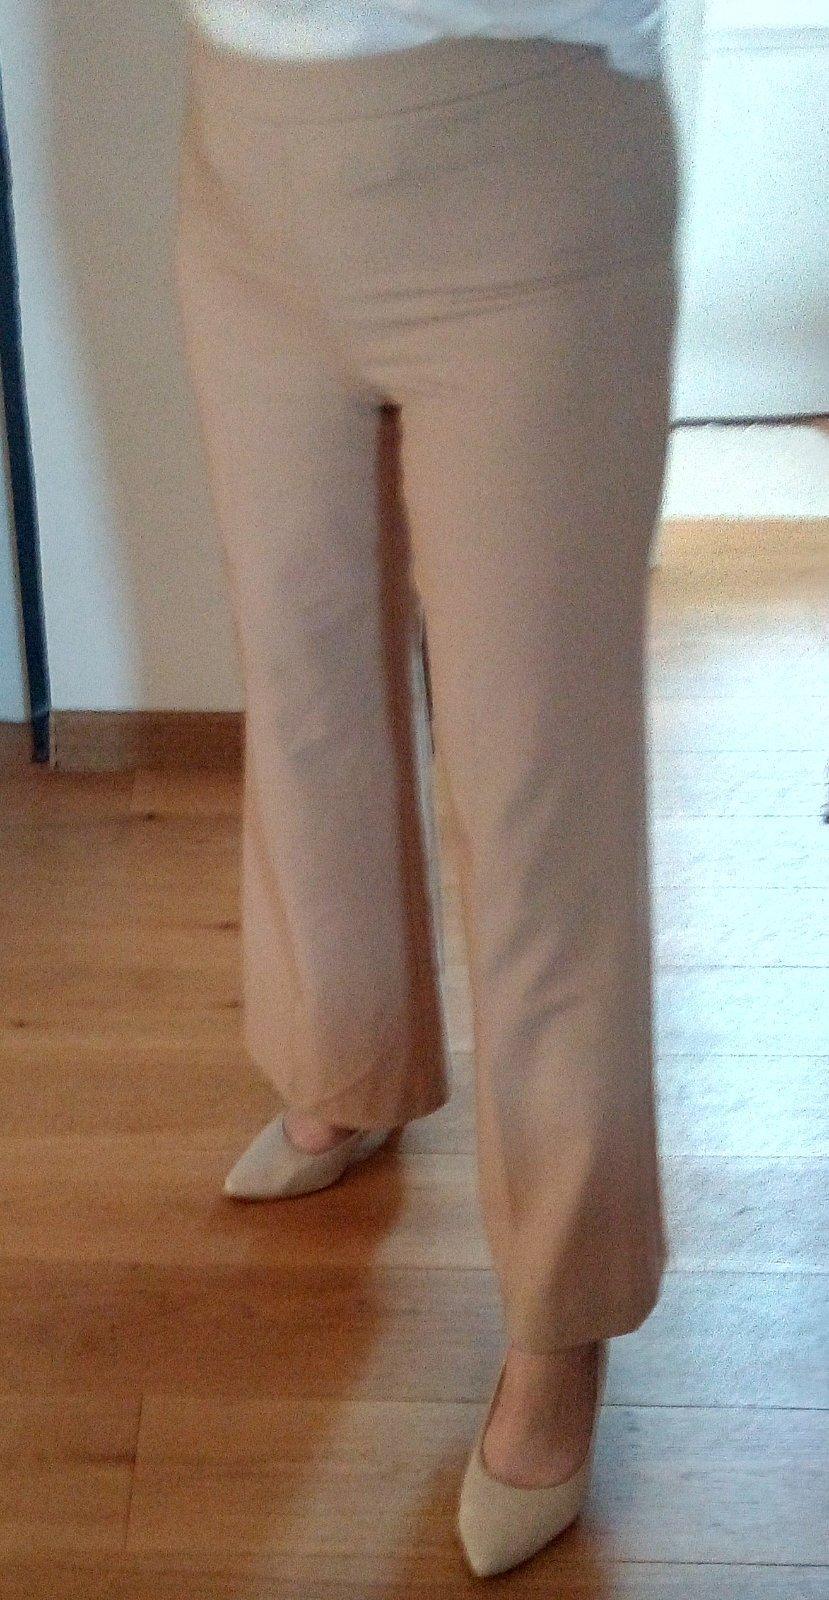 Béžové zvonové nohavice S/M - Obrázok č. 1